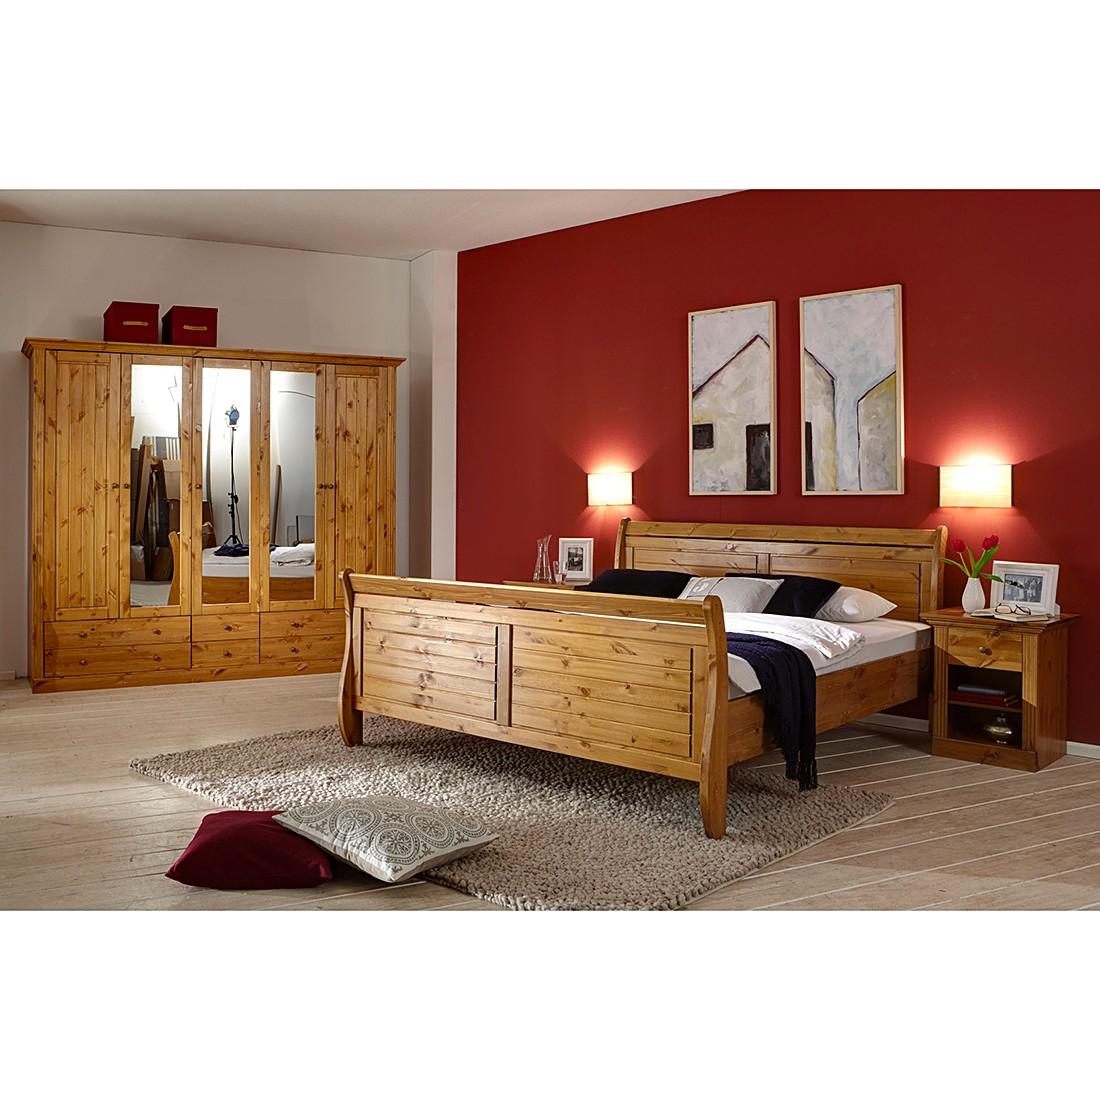 Schlafzimmer Set Lyngby (4-teilig) - Kiefer massiv - Provence, Steens günstig online kaufen